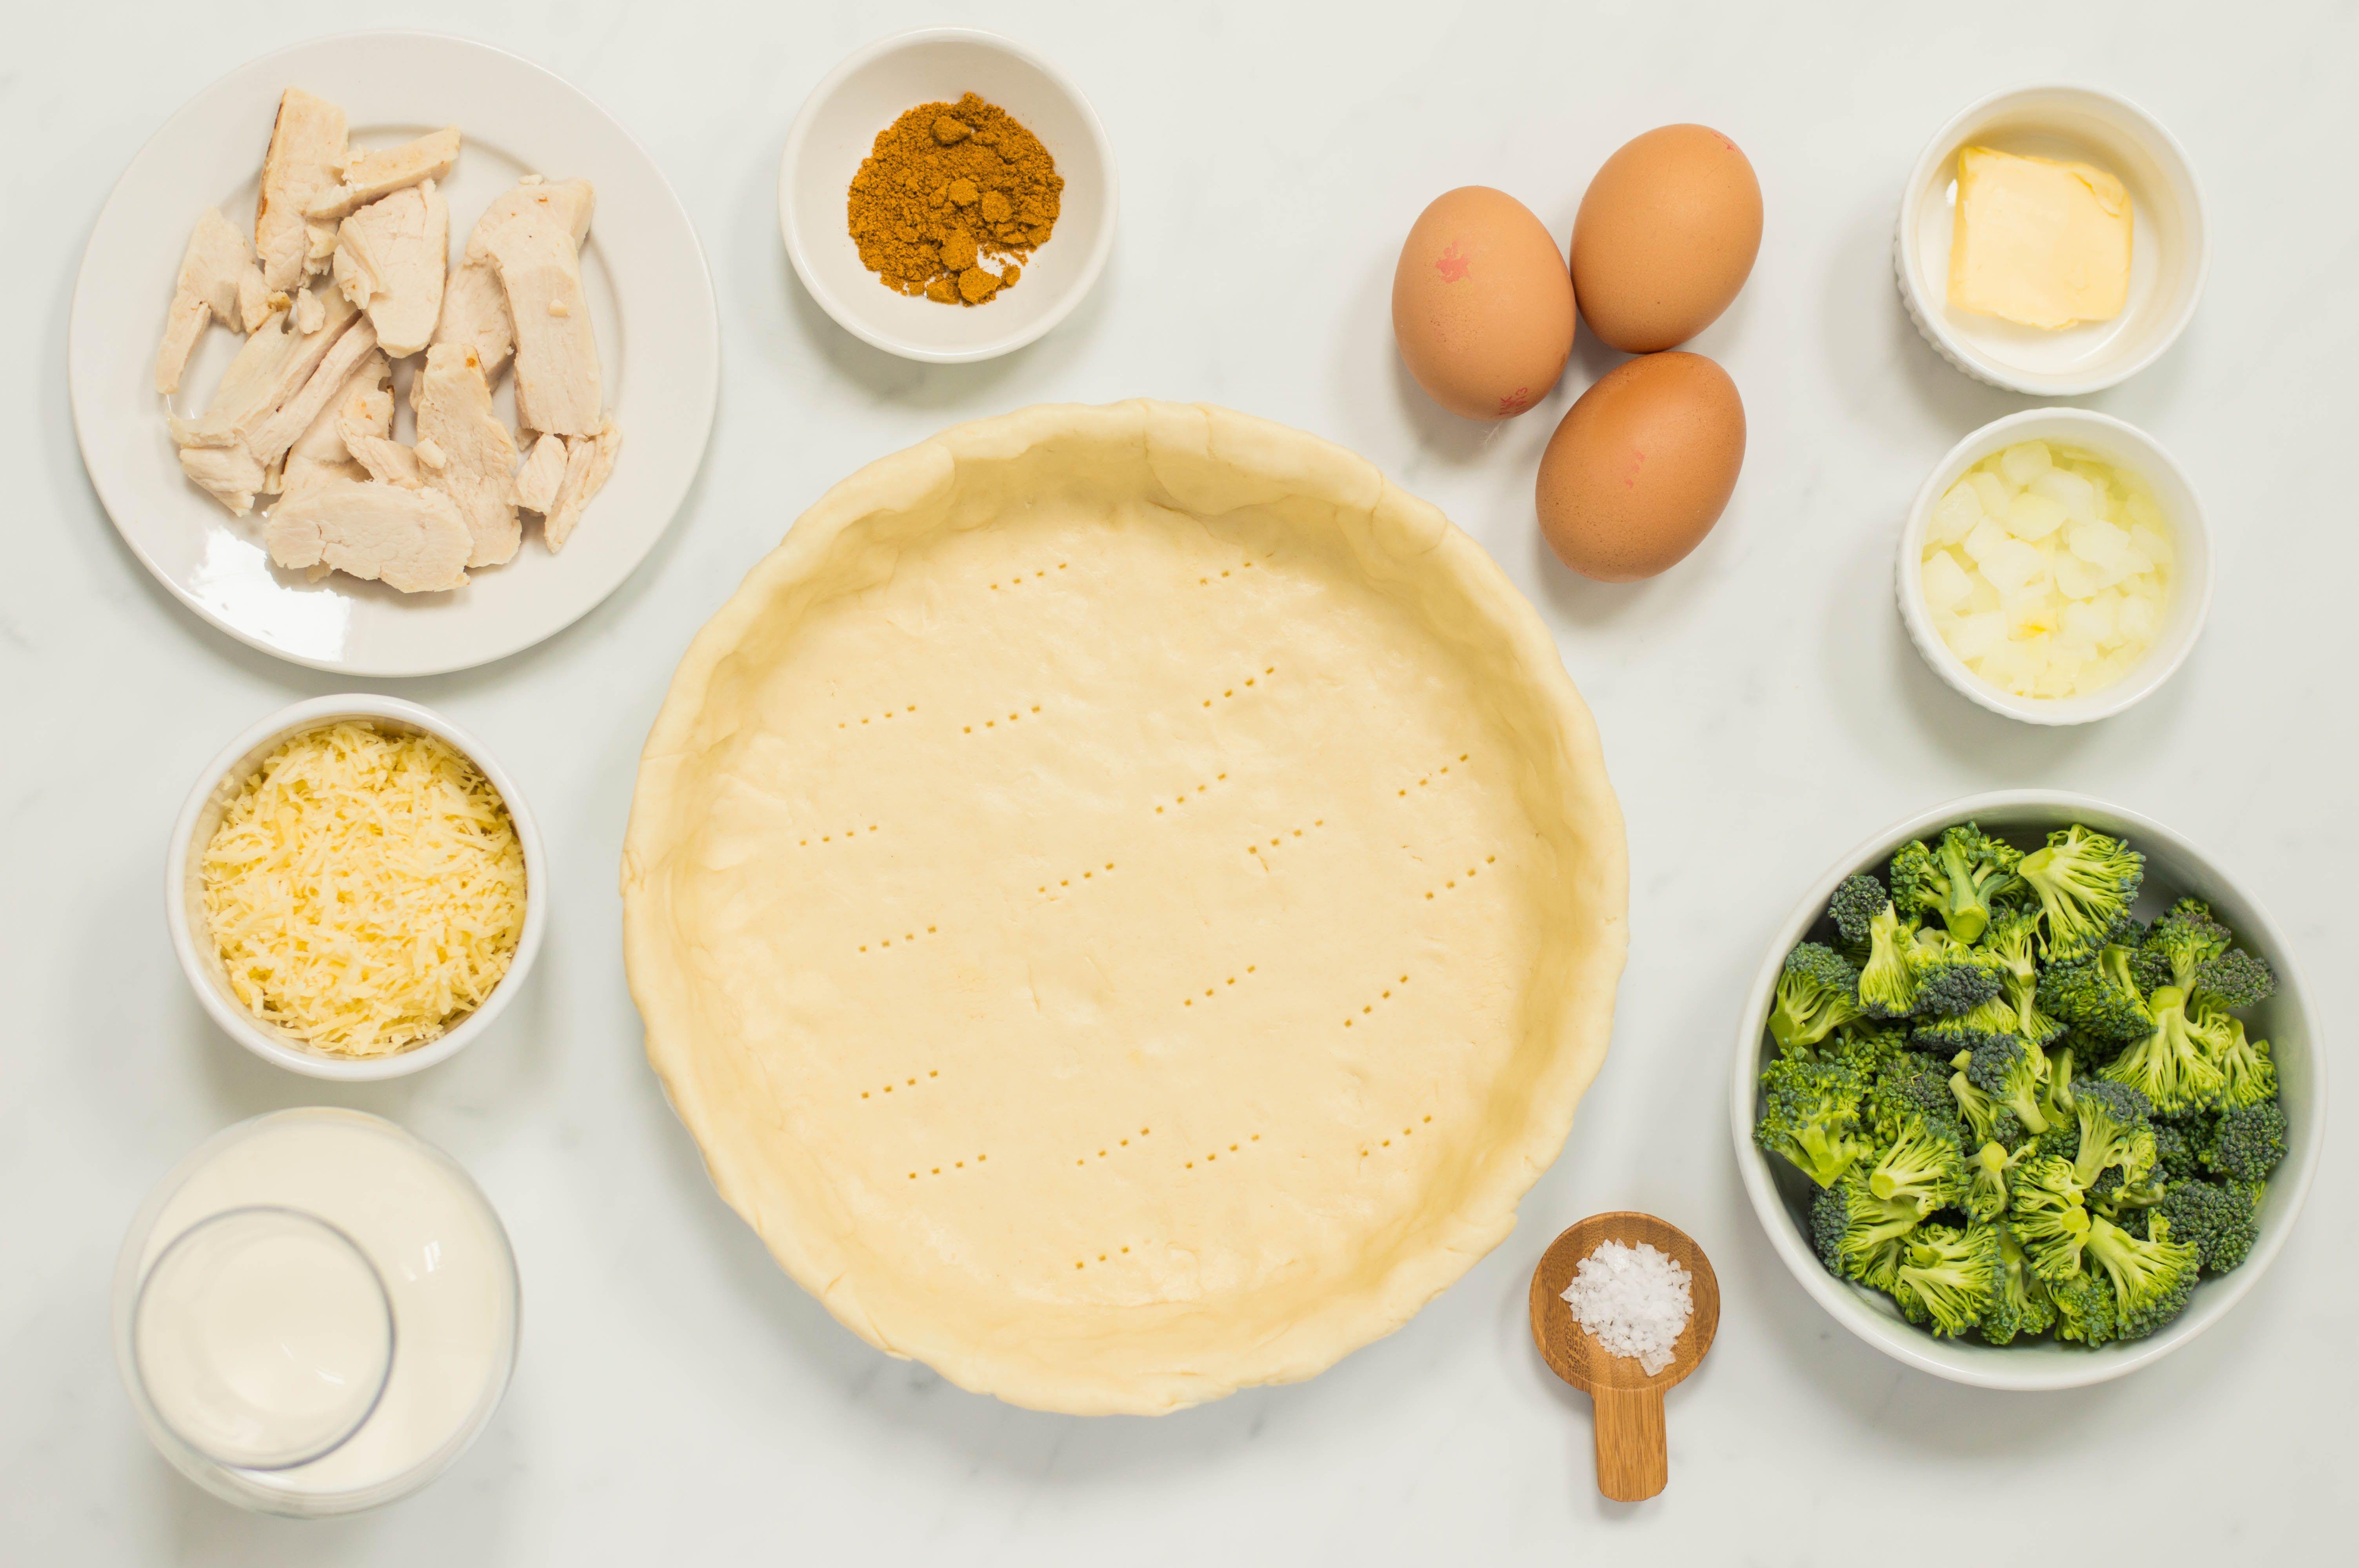 Turkey and Broccoli Quiche Recipe ingredients